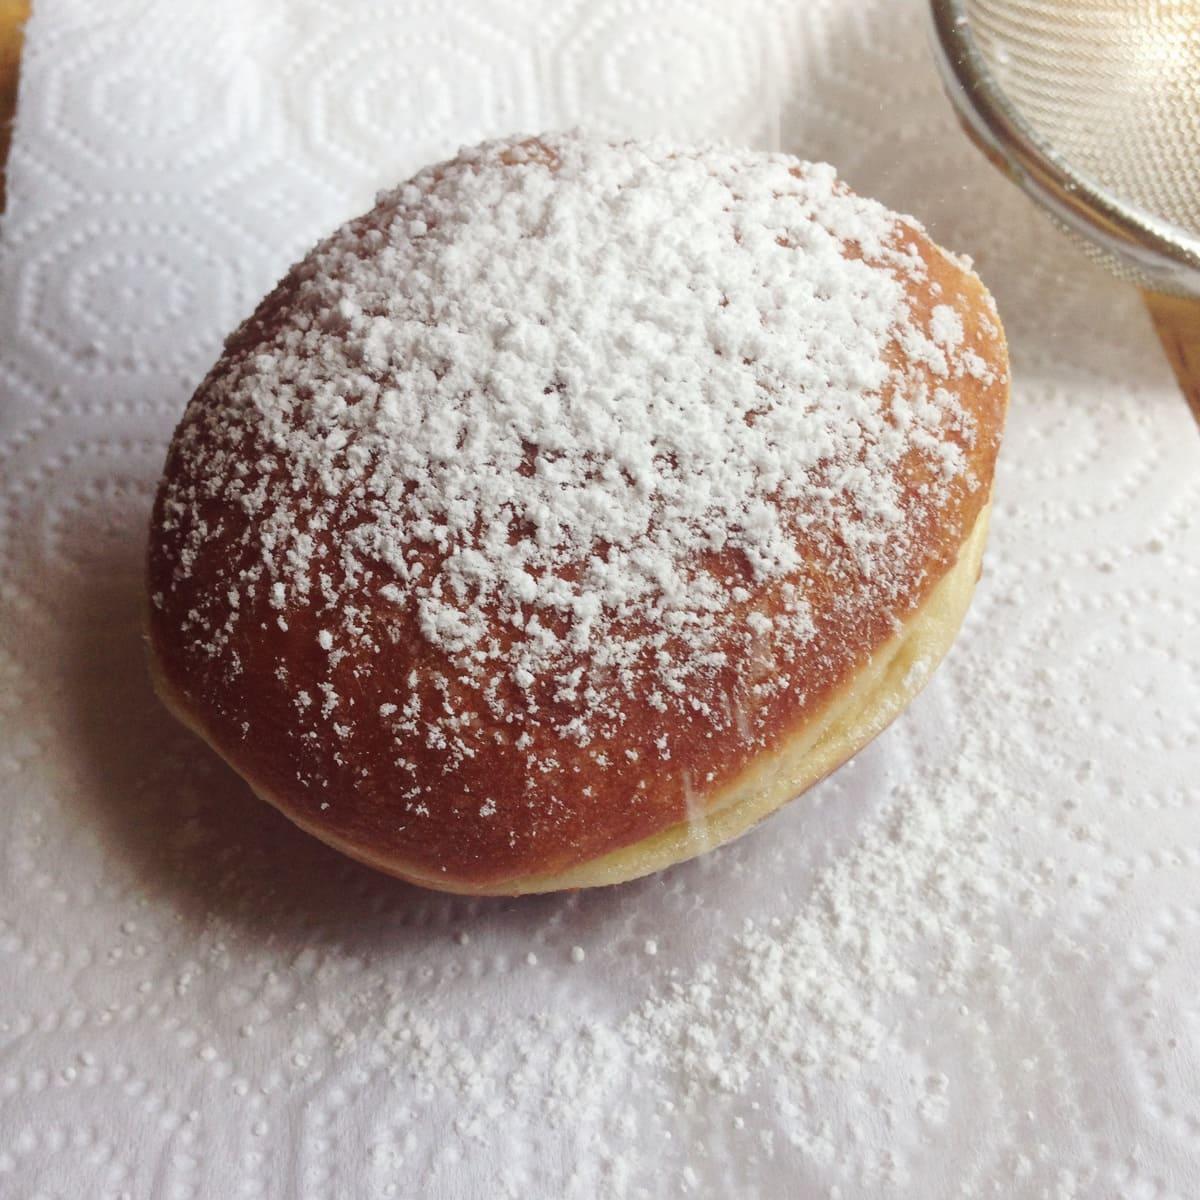 Doughnuts | www.acozykitchen.com